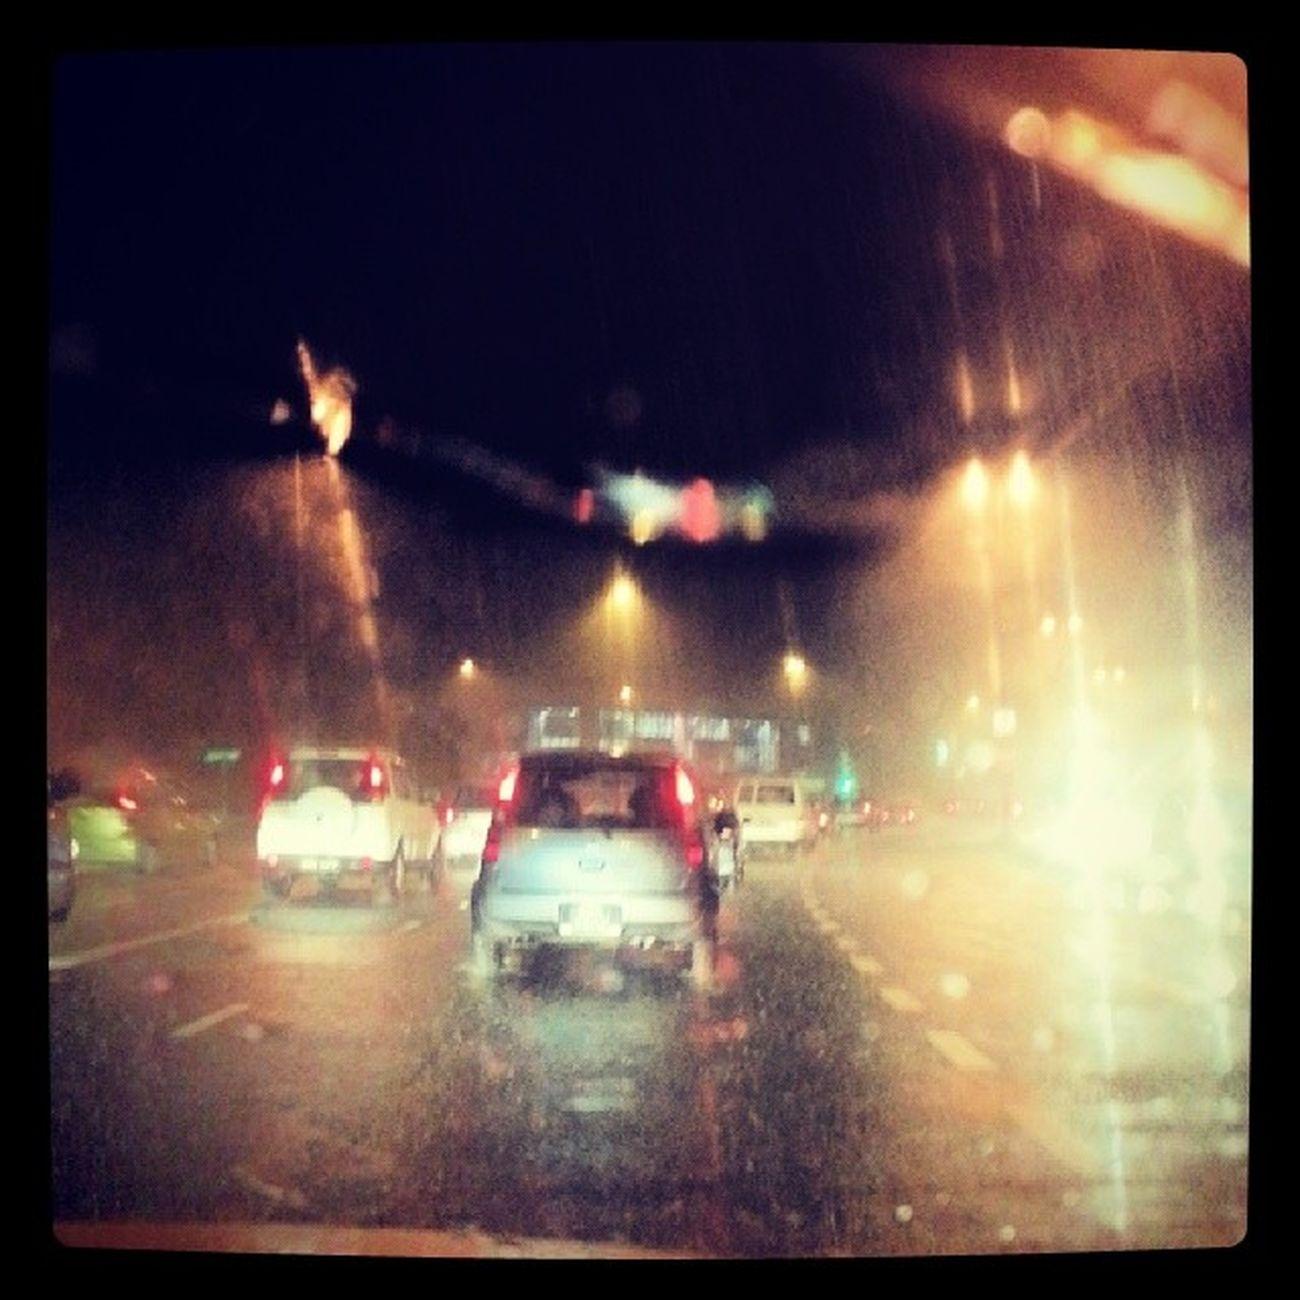 Hujan berat... hati hati dijalan raya Roadsafety Brunei Andrography InstaBruDroid